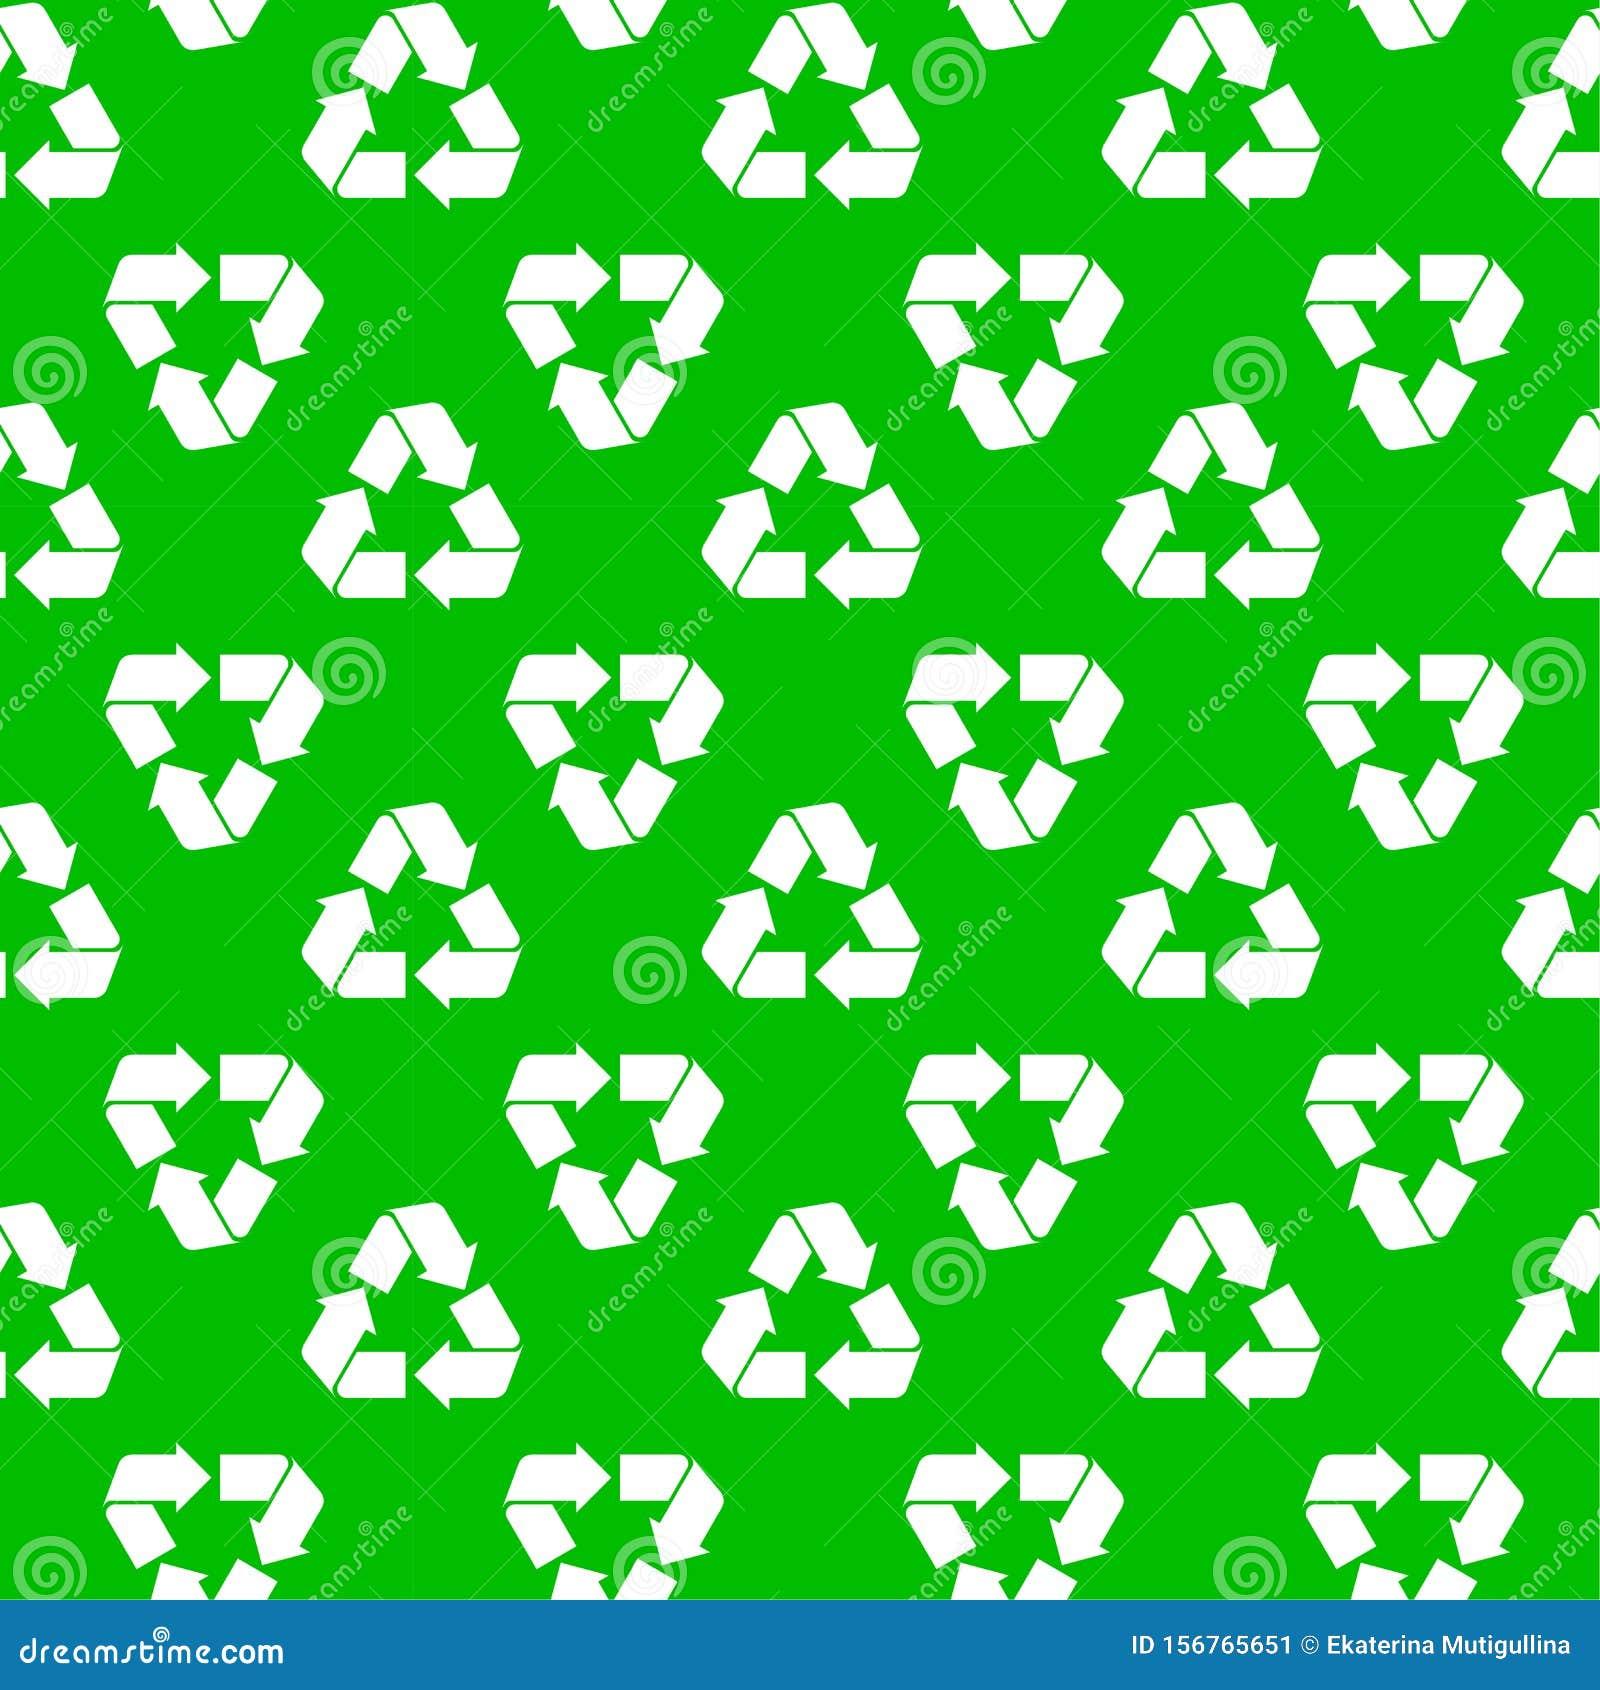 Seamless recycling pattern green